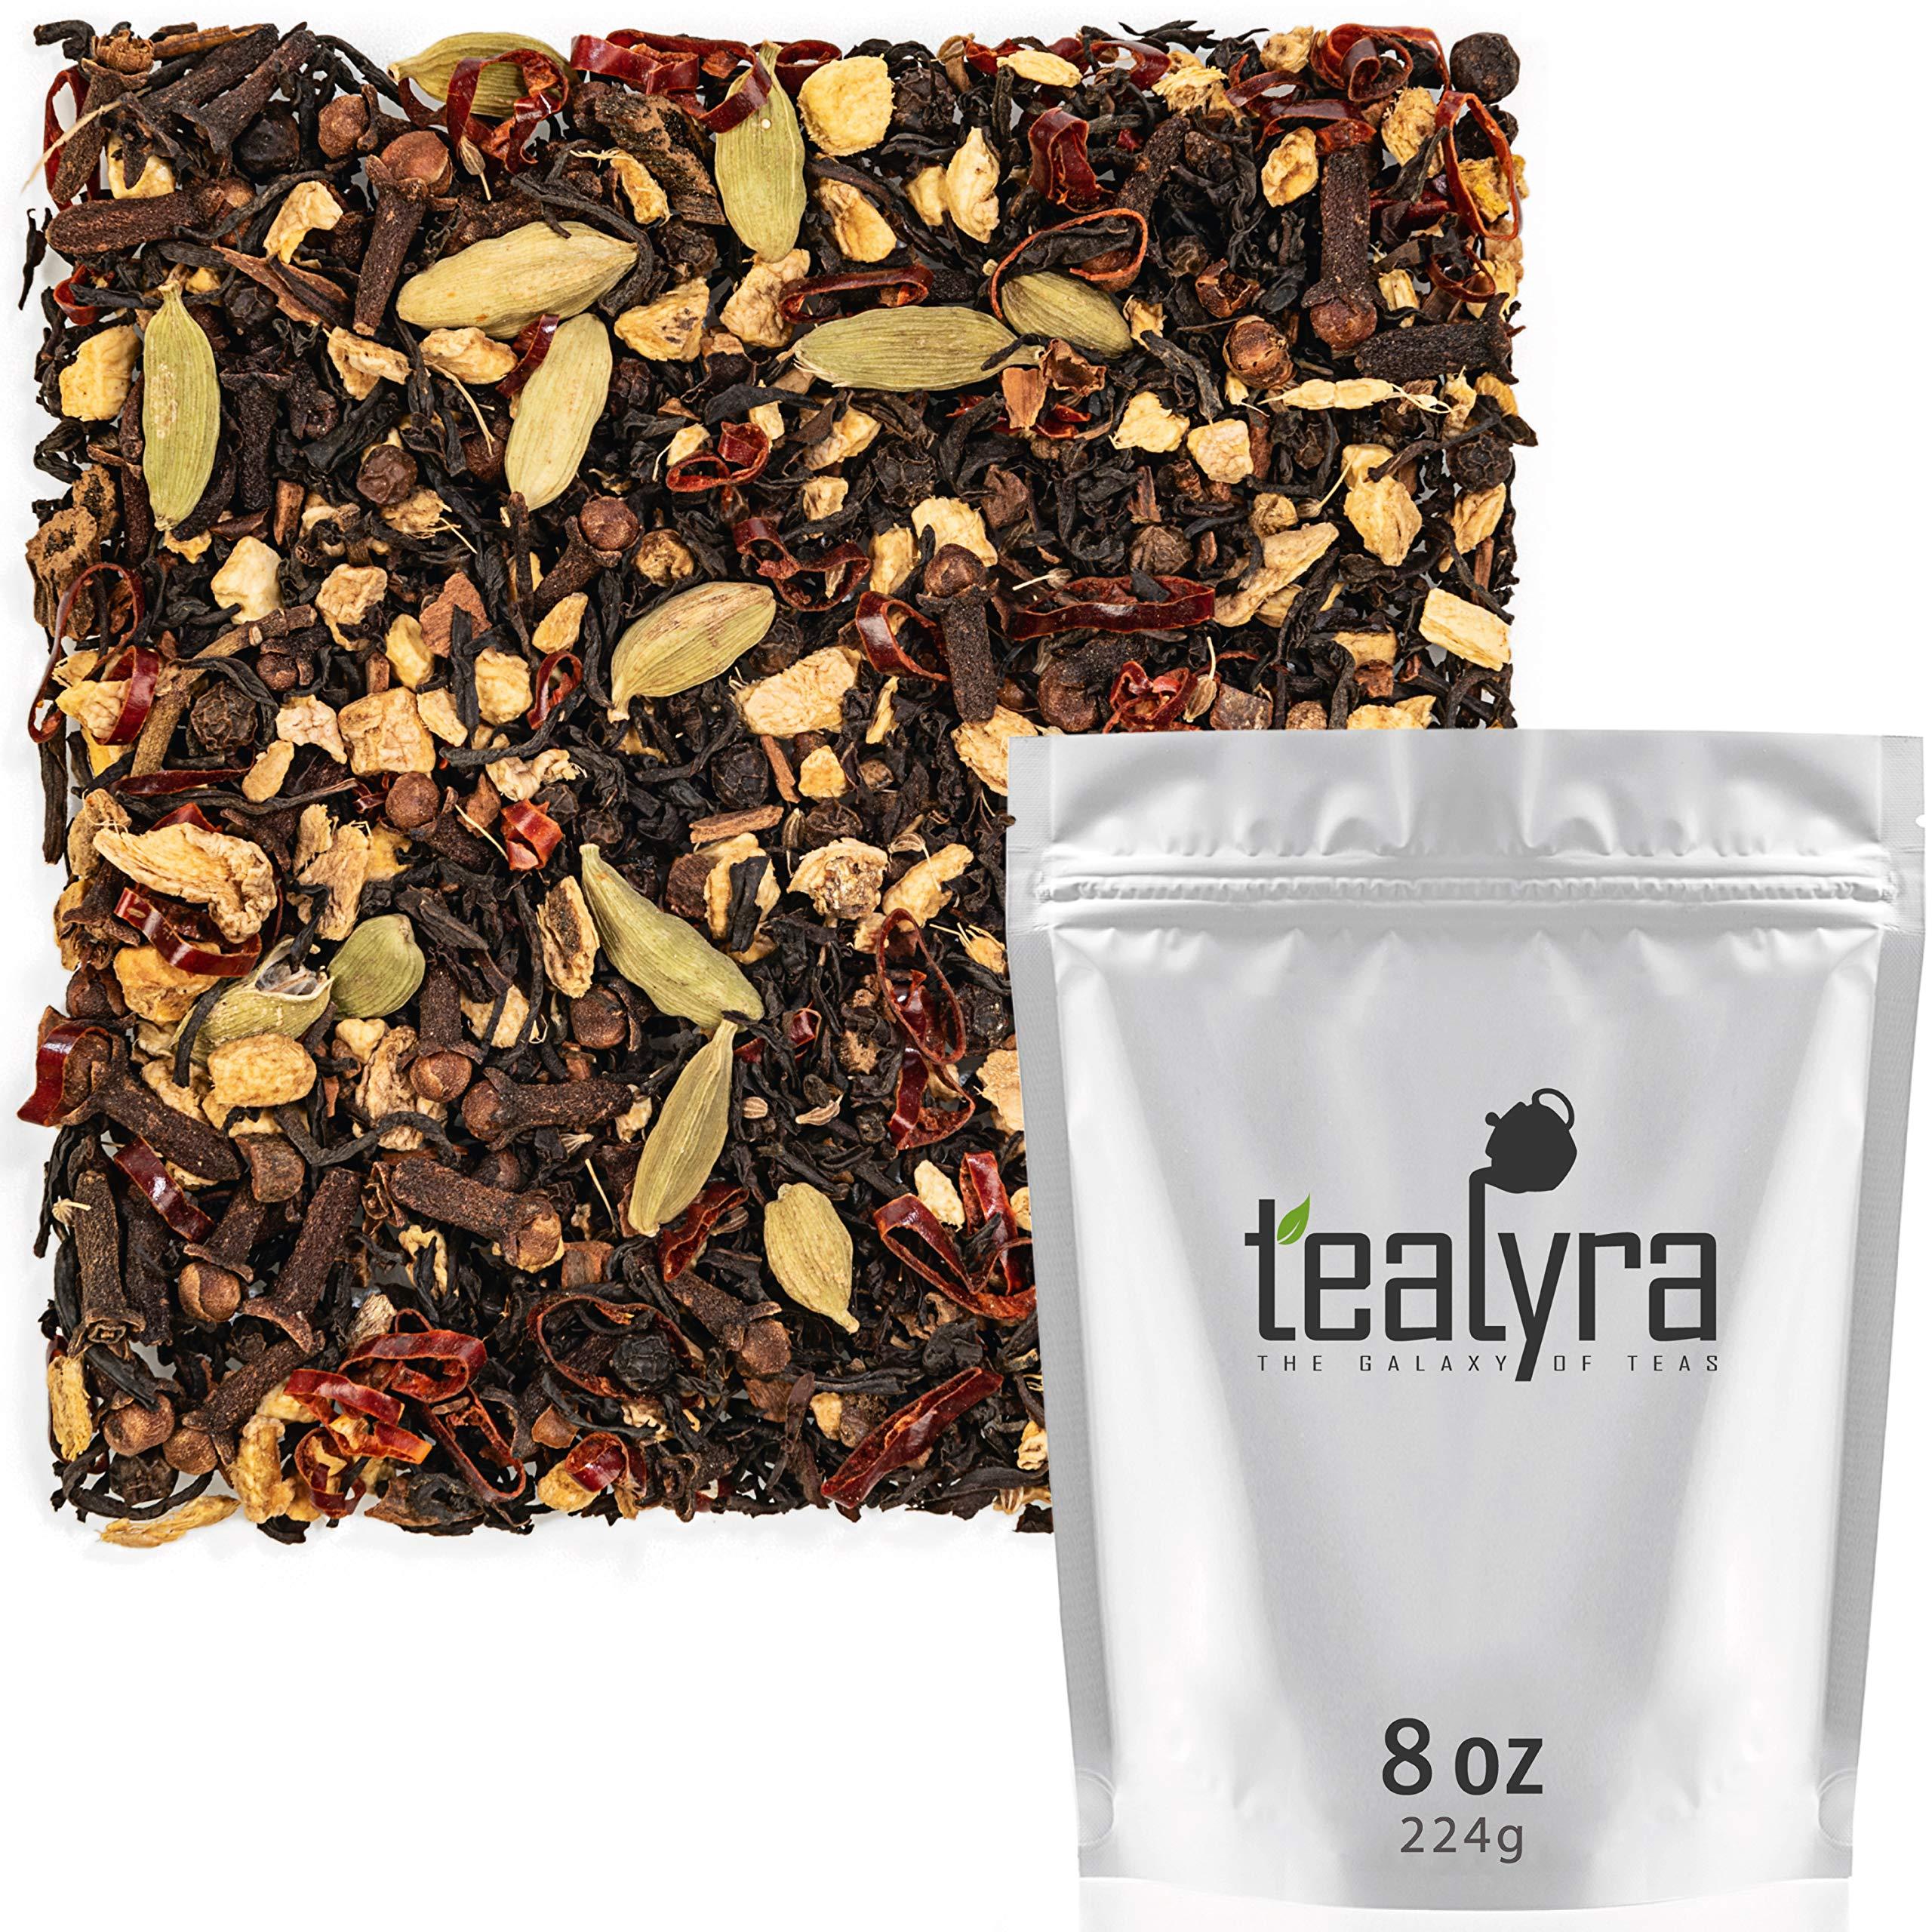 Tealyra - Spicy Chili Pepper Chai - Black Tea - Ginger - Cardamom - Cinnamon - Vanilla - Warm Spicy Loose Leaf Tea - 224g (8-ounce)